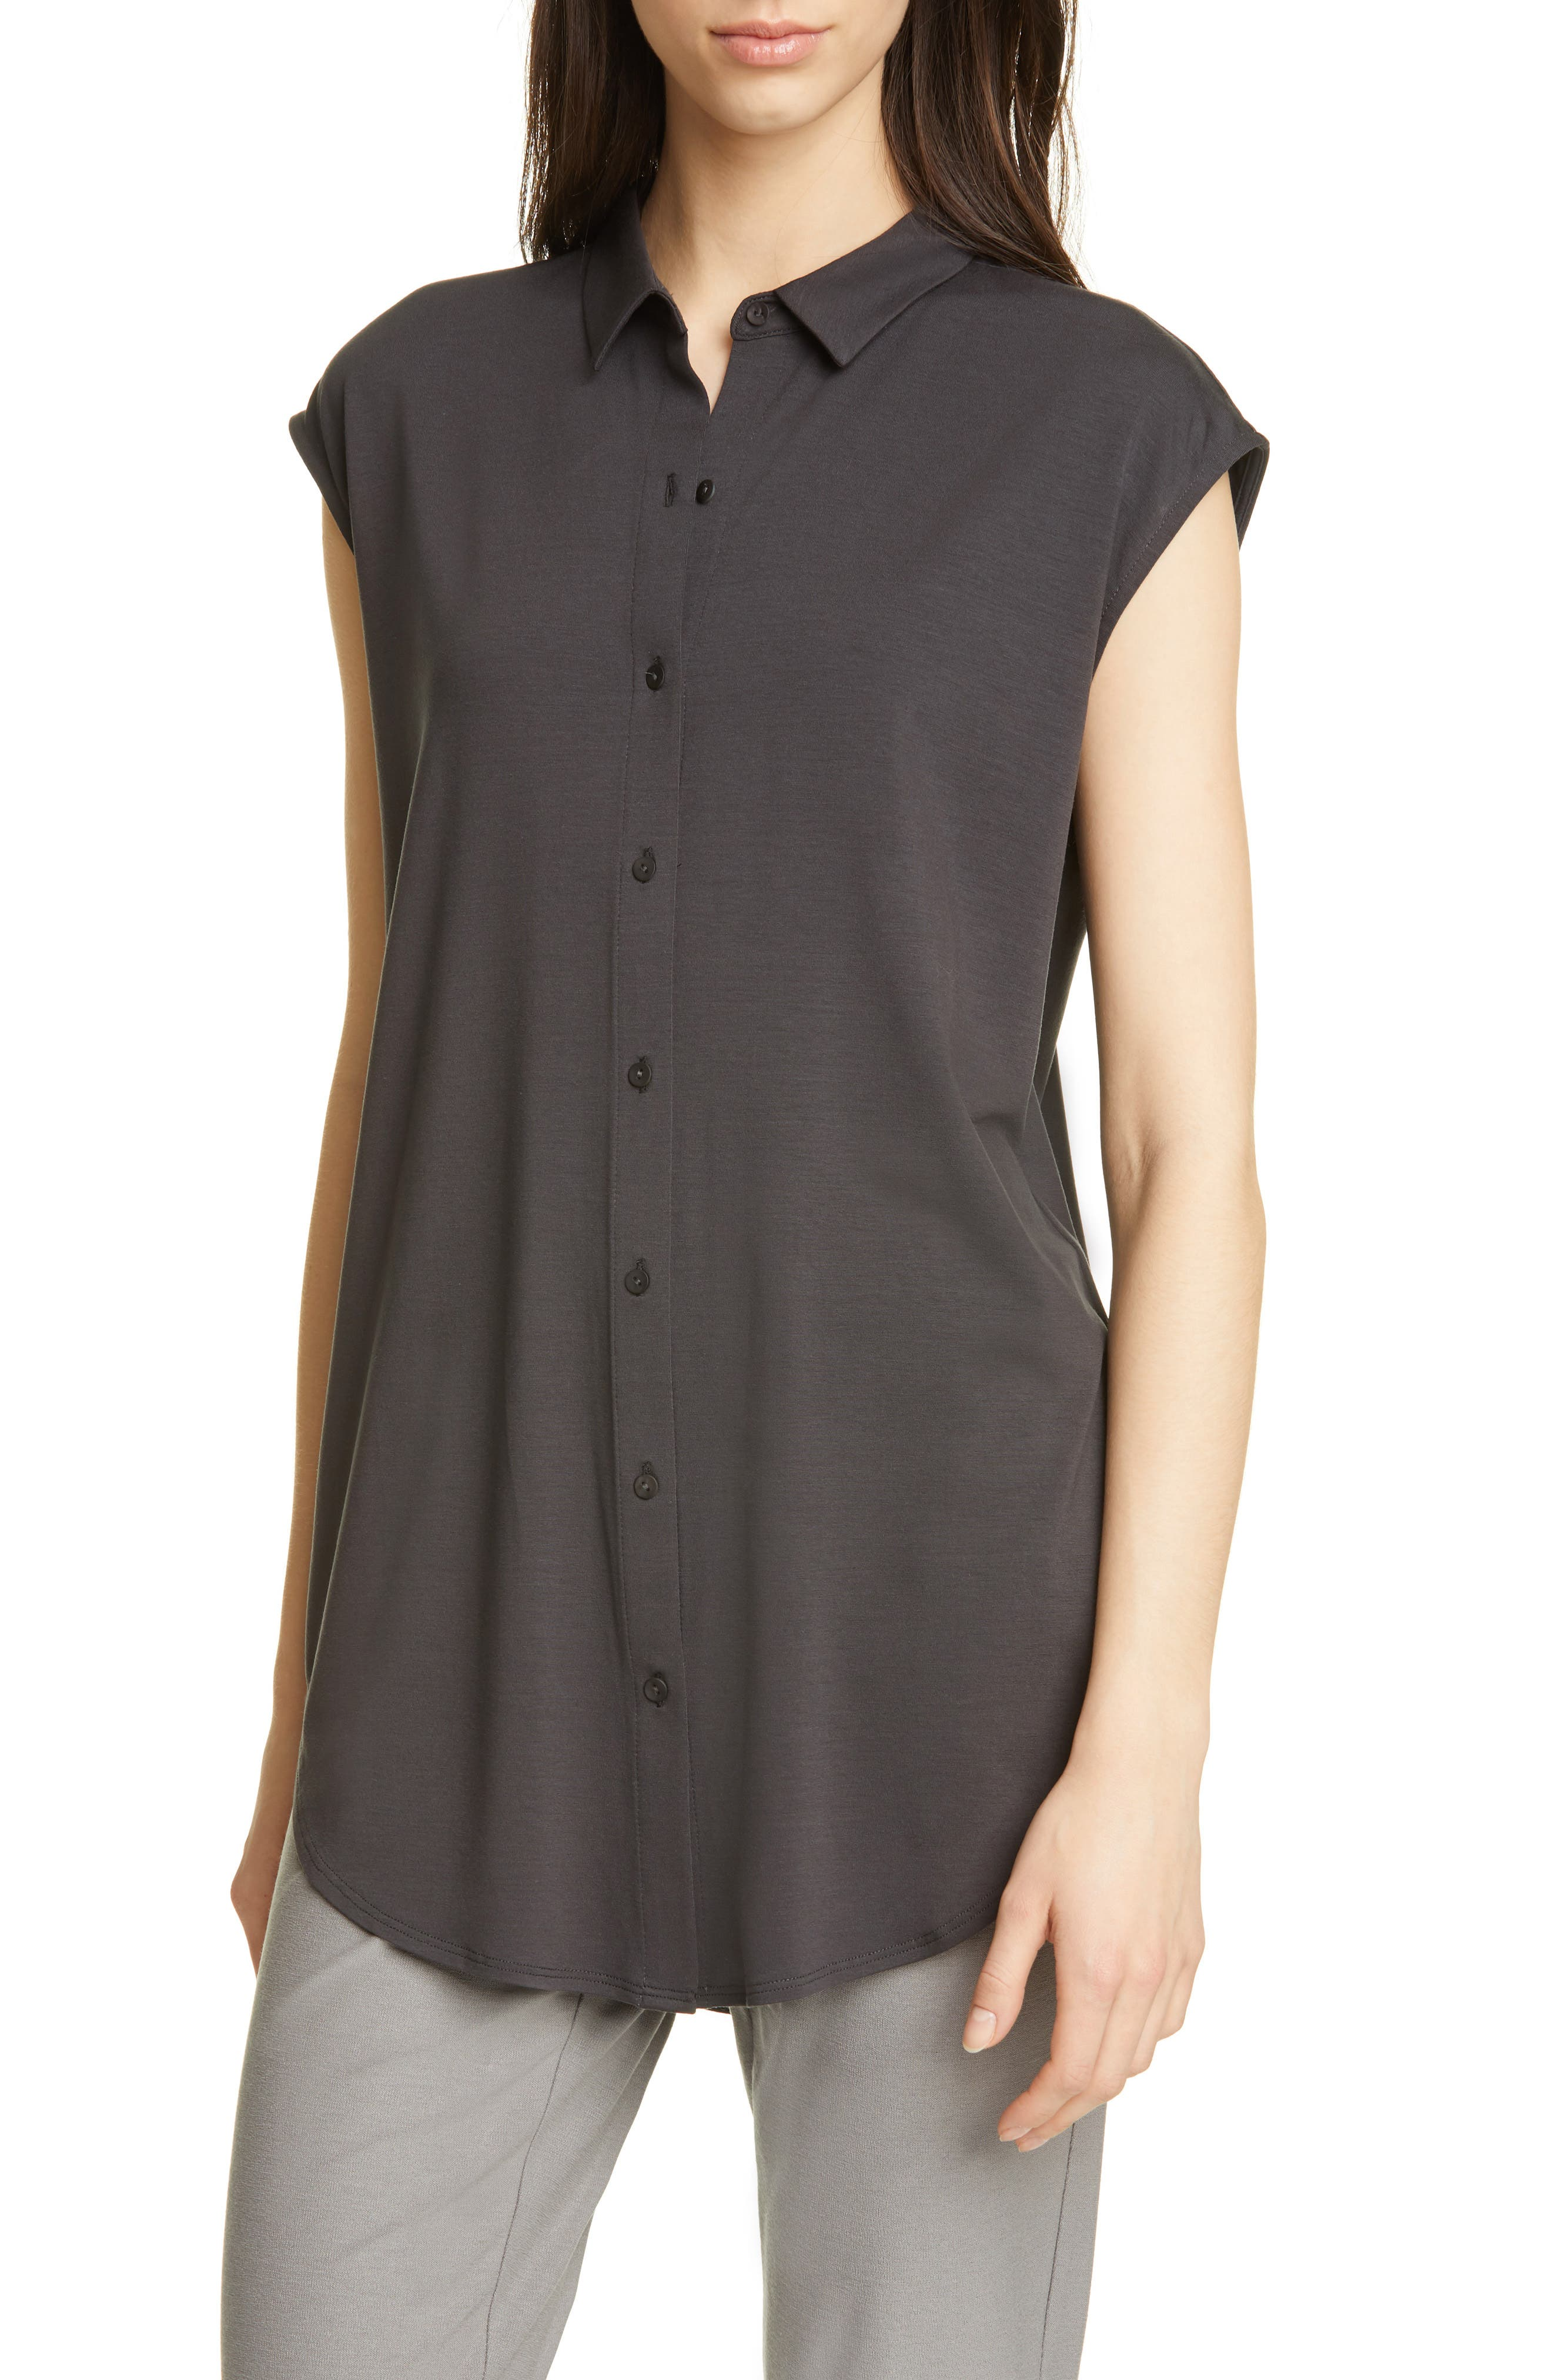 Eileen Fisher Classic Collar Sleeveless Shirt, Grey